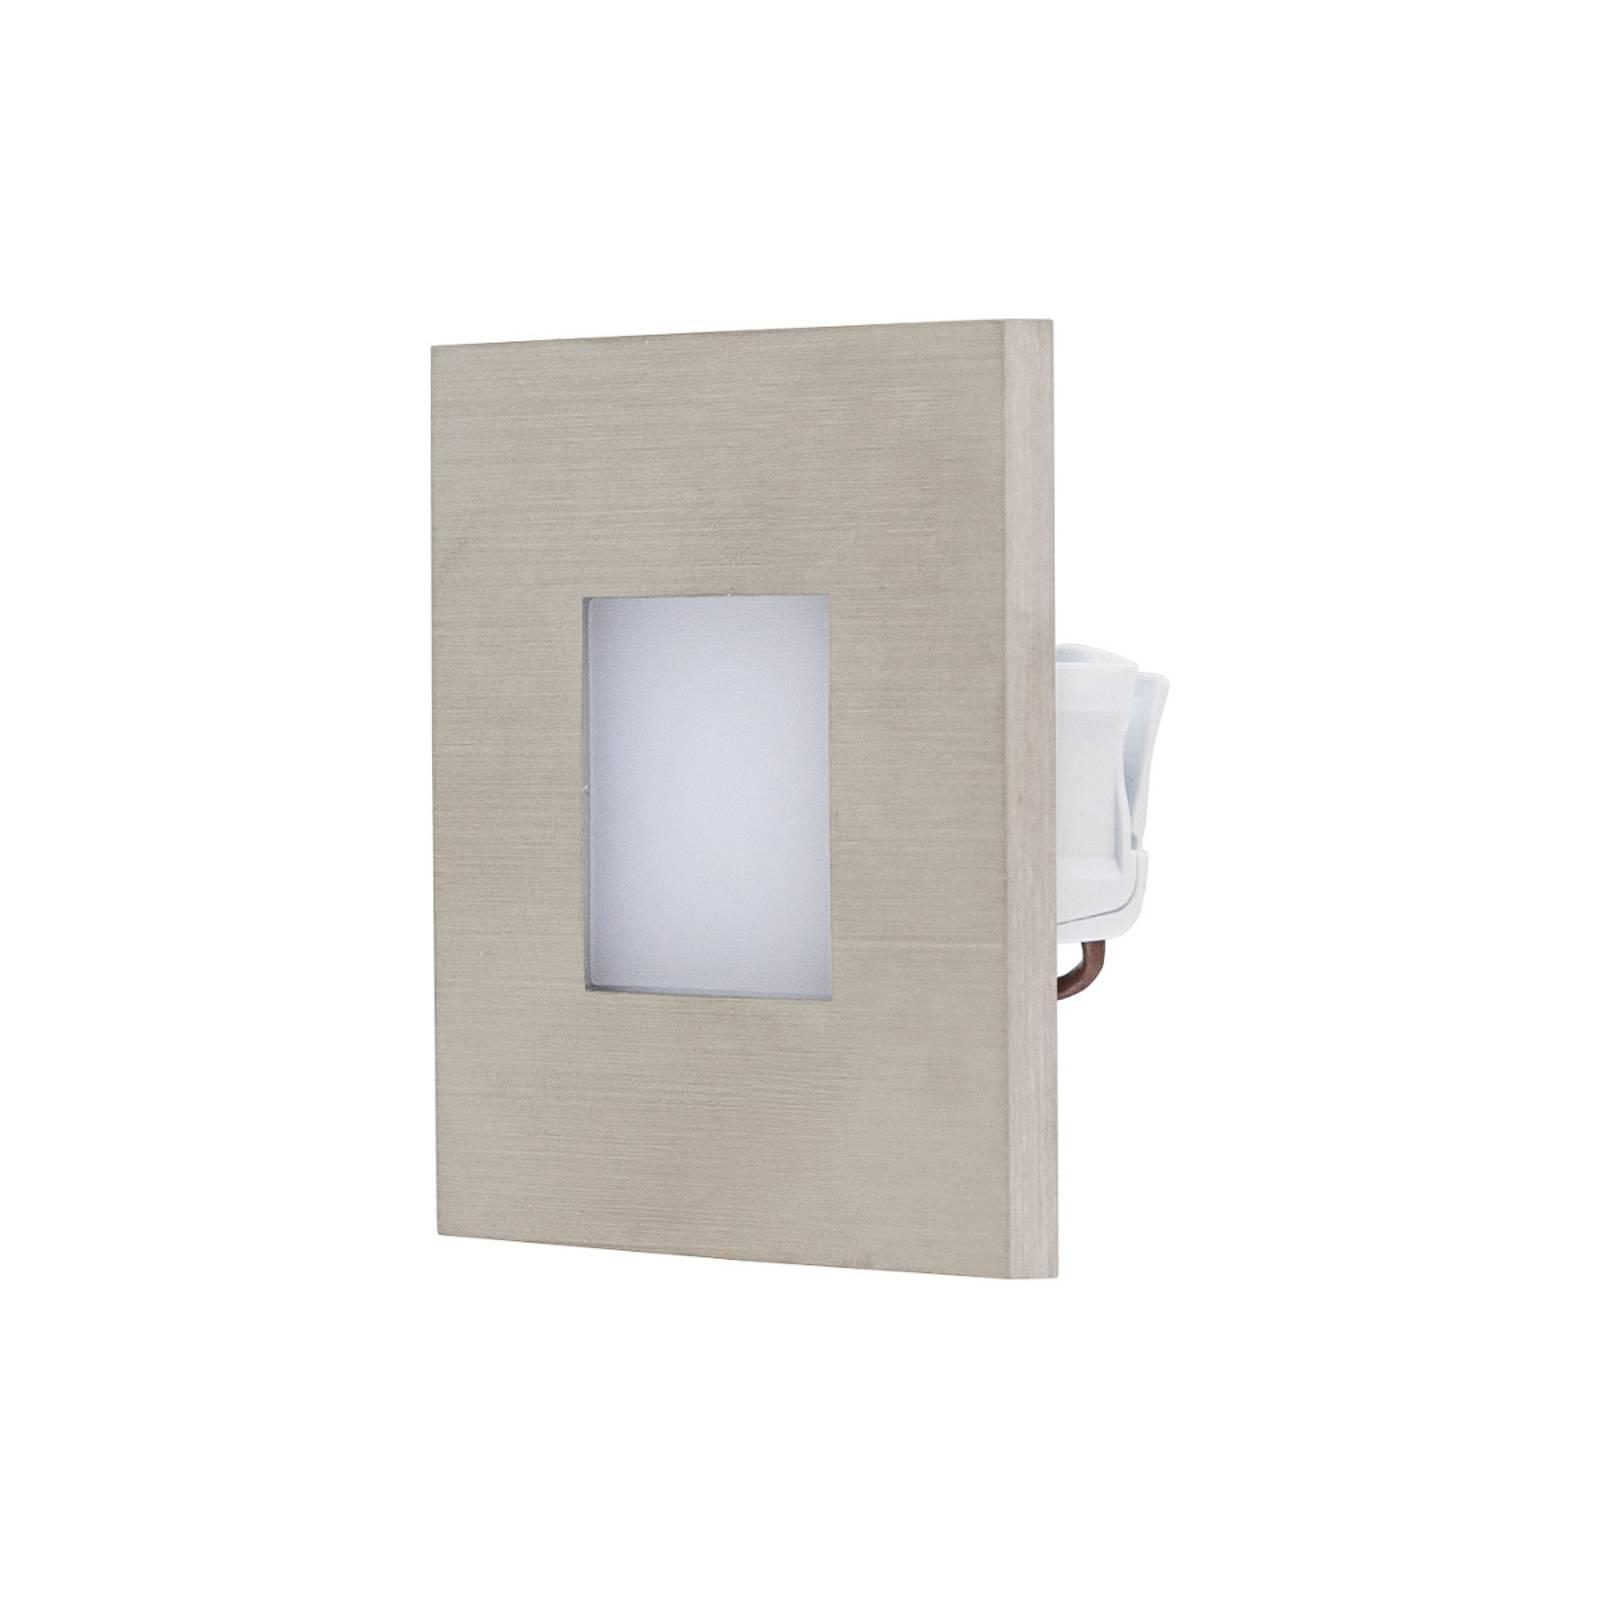 EVN LQ230 -LED-seinäuppovalaisin, teräs